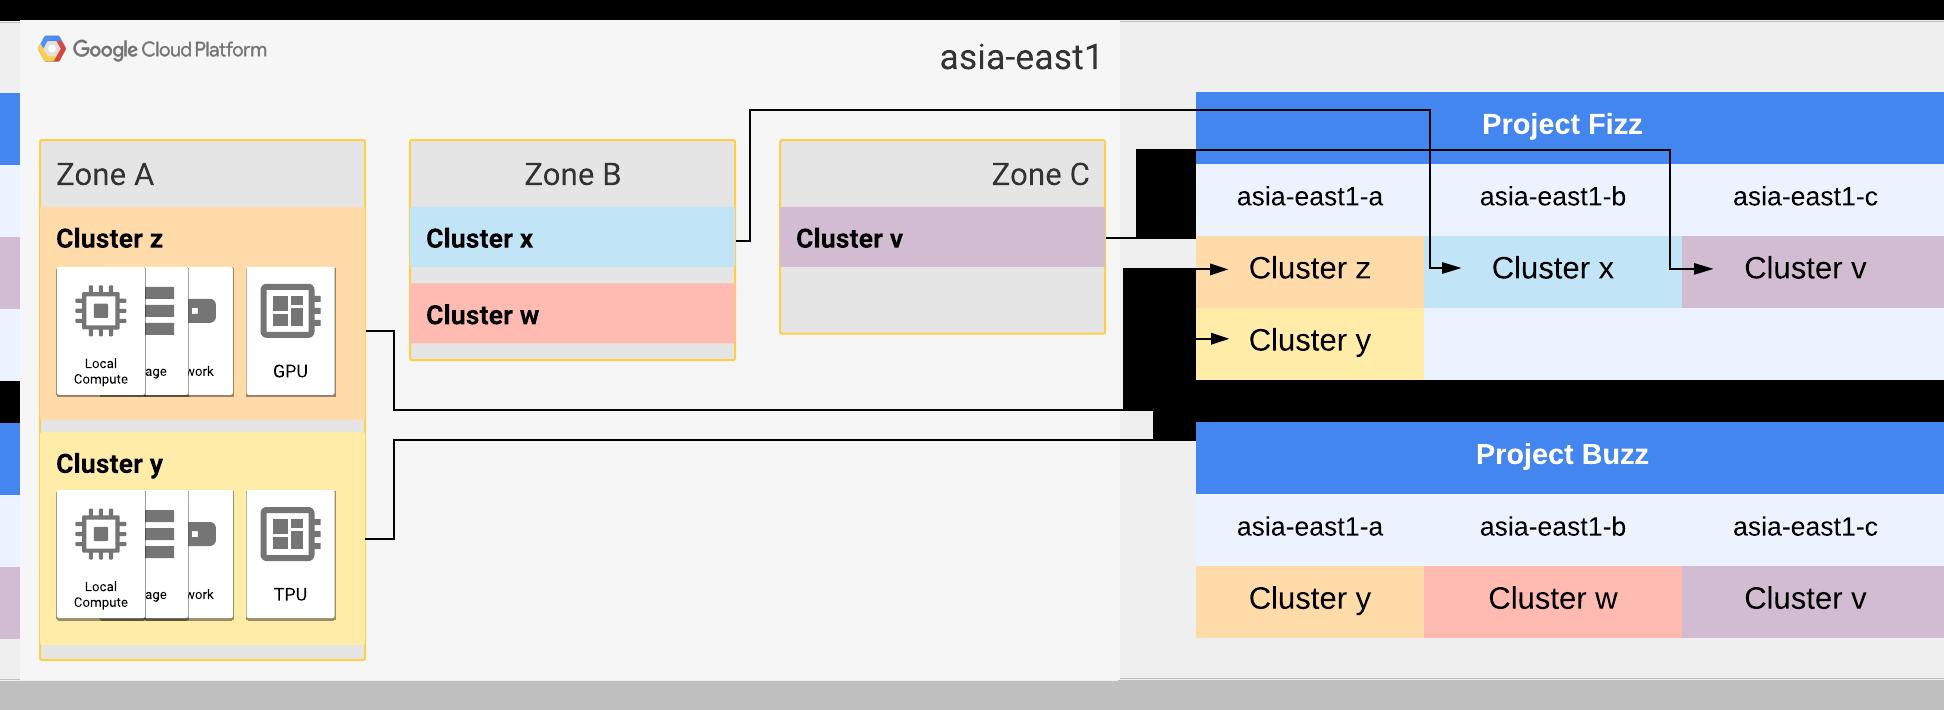 asia-east1 可用区 A 和 B 分别扩展为两个集群。